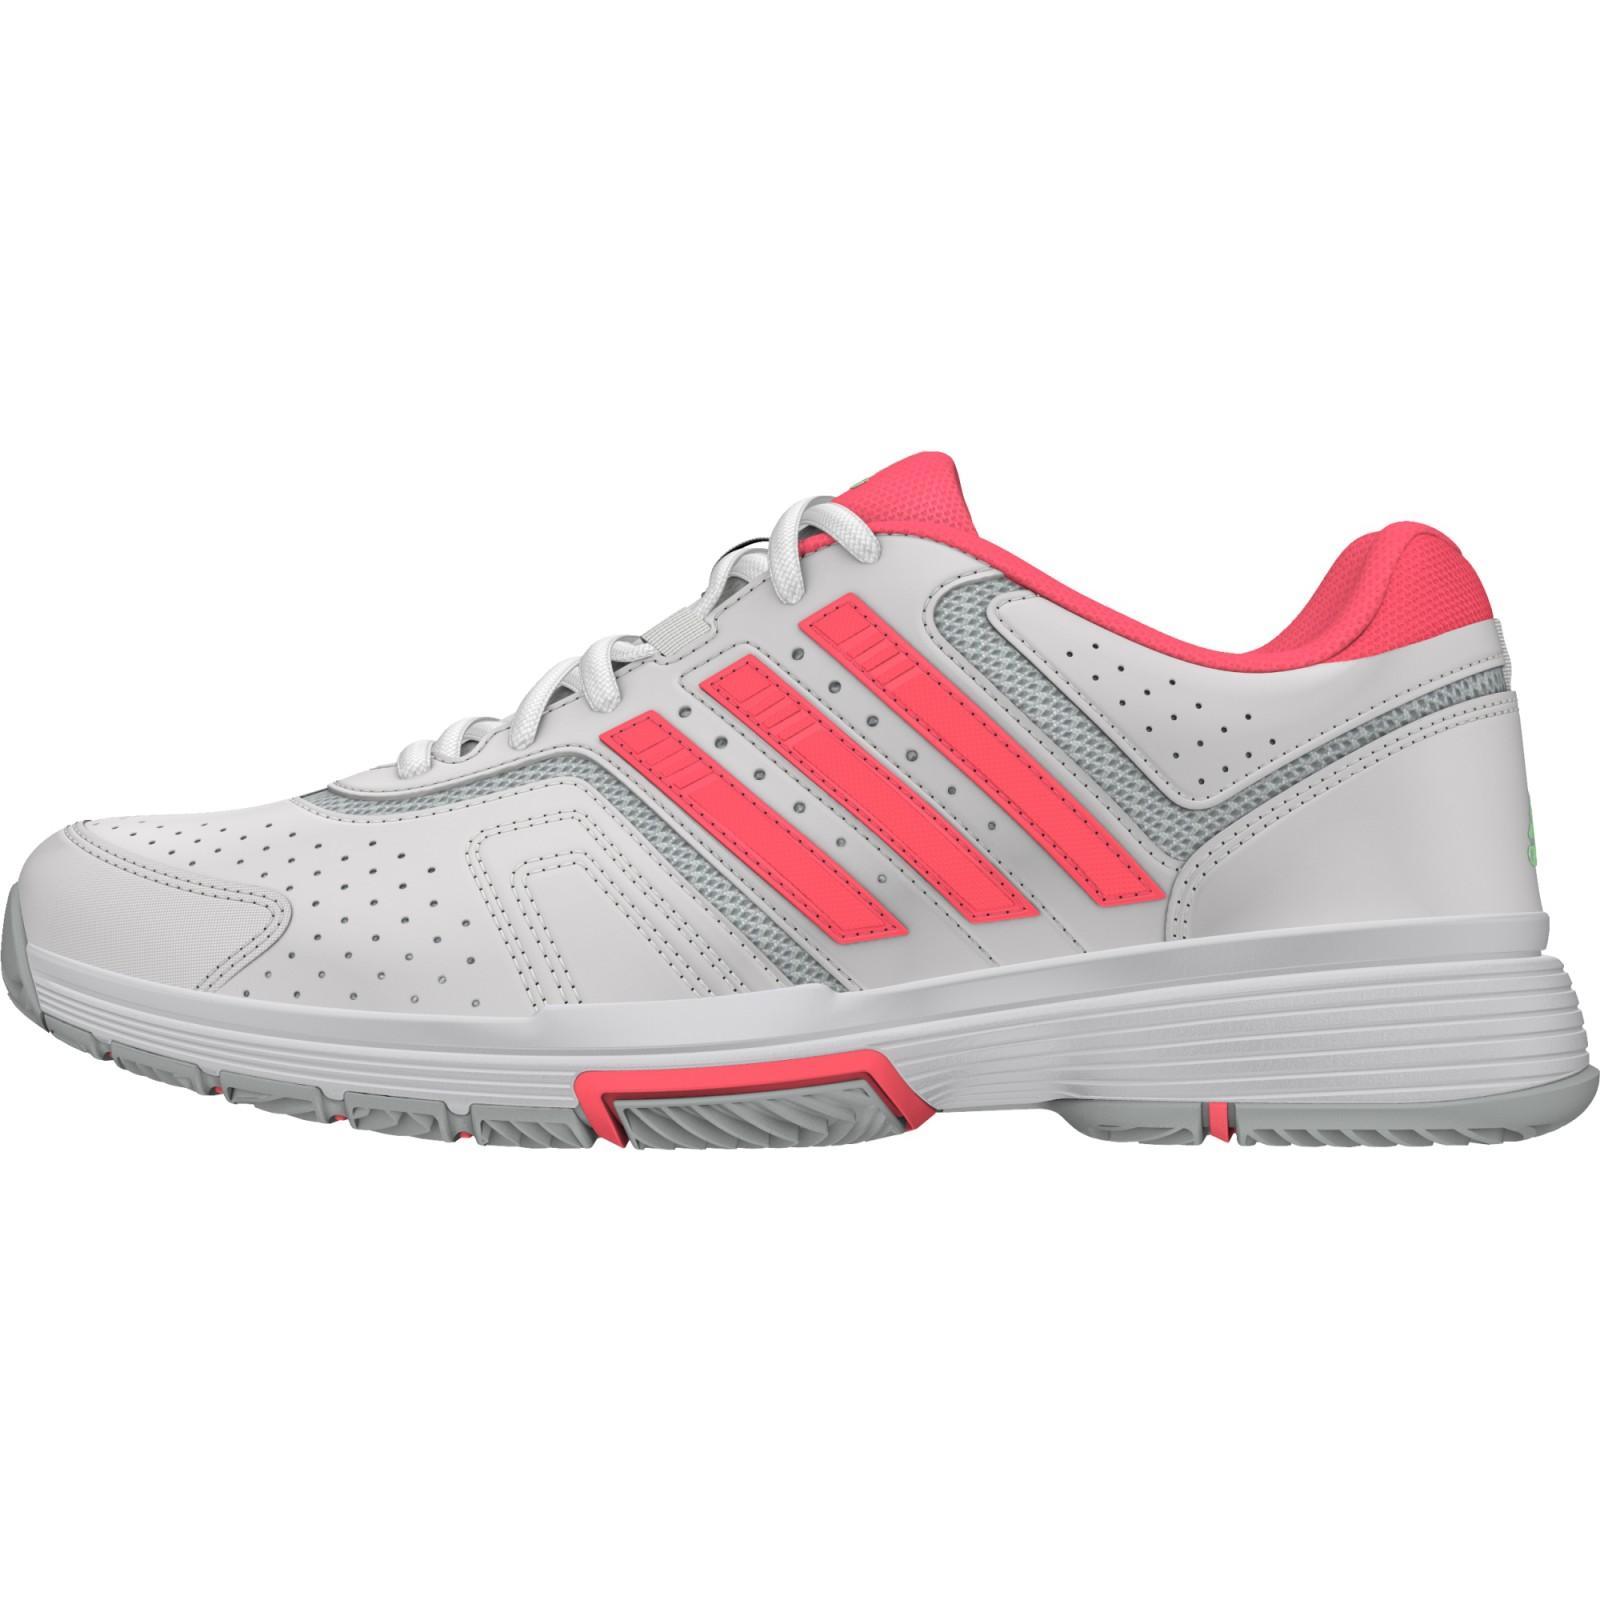 ecfe72dee27 Dámské tenisové boty adidas barricade court w